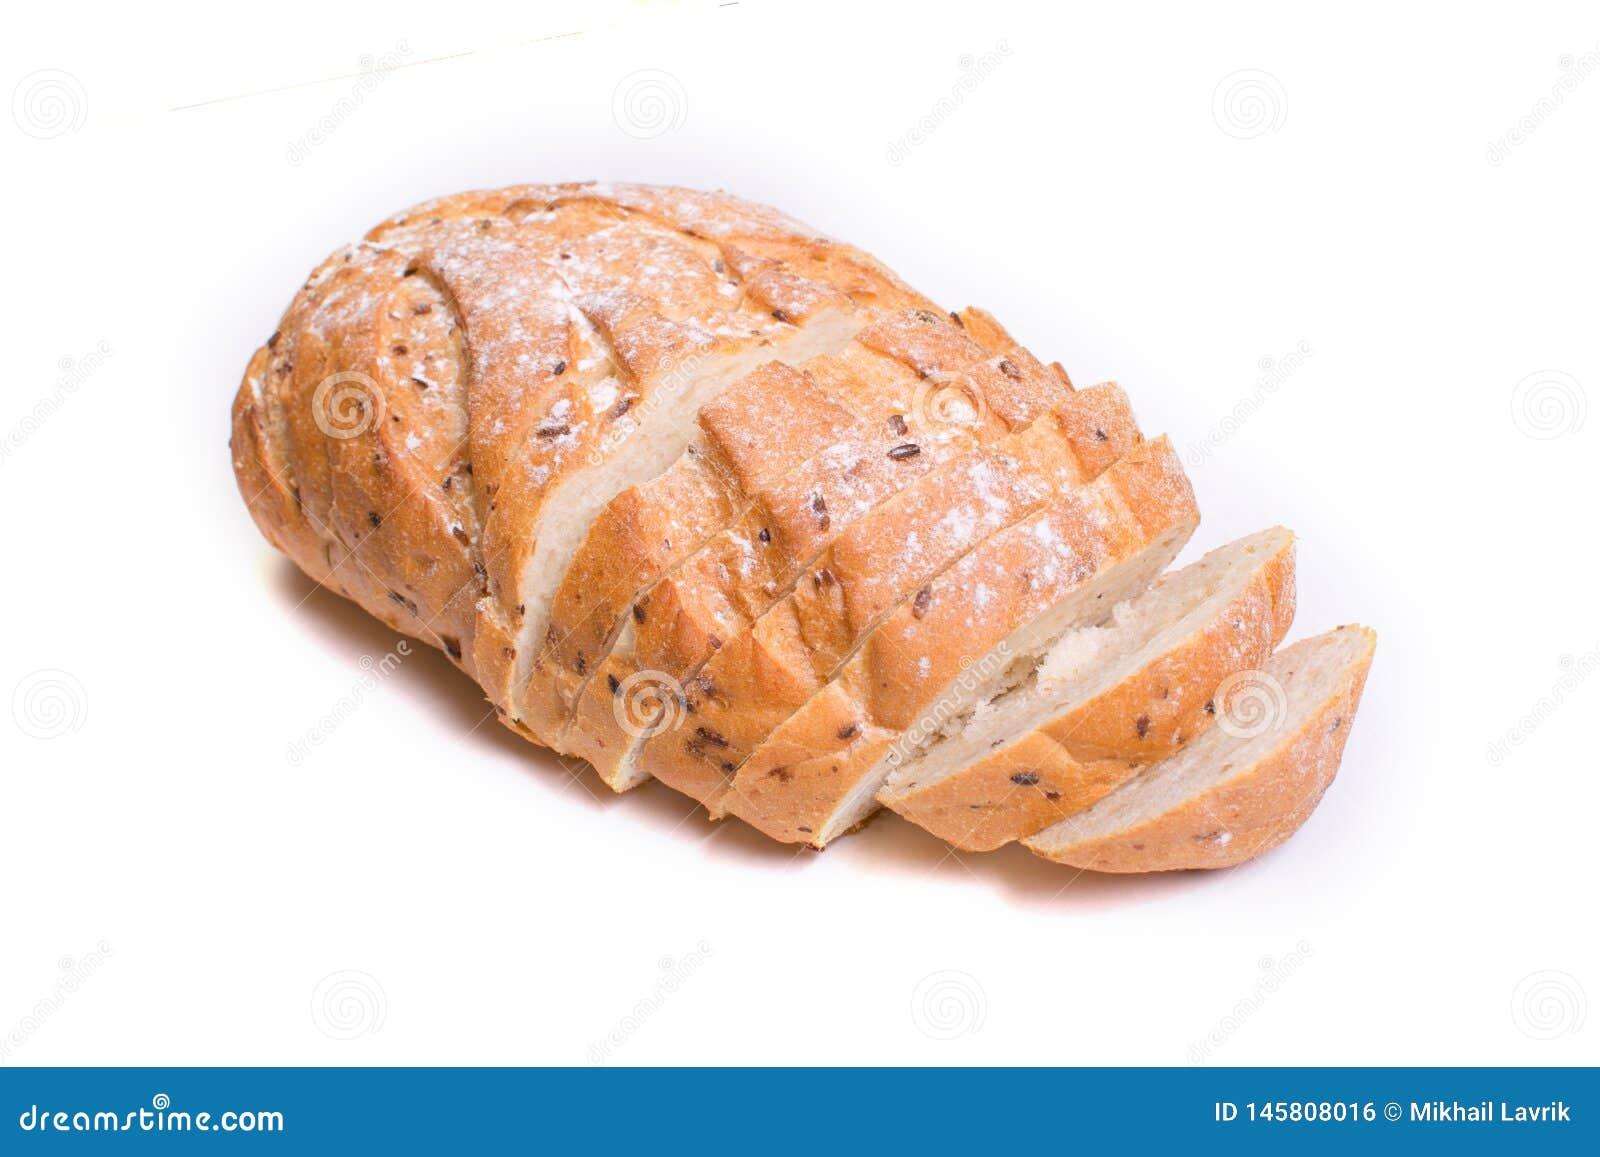 Сrispy healthy white bread. Isolated.